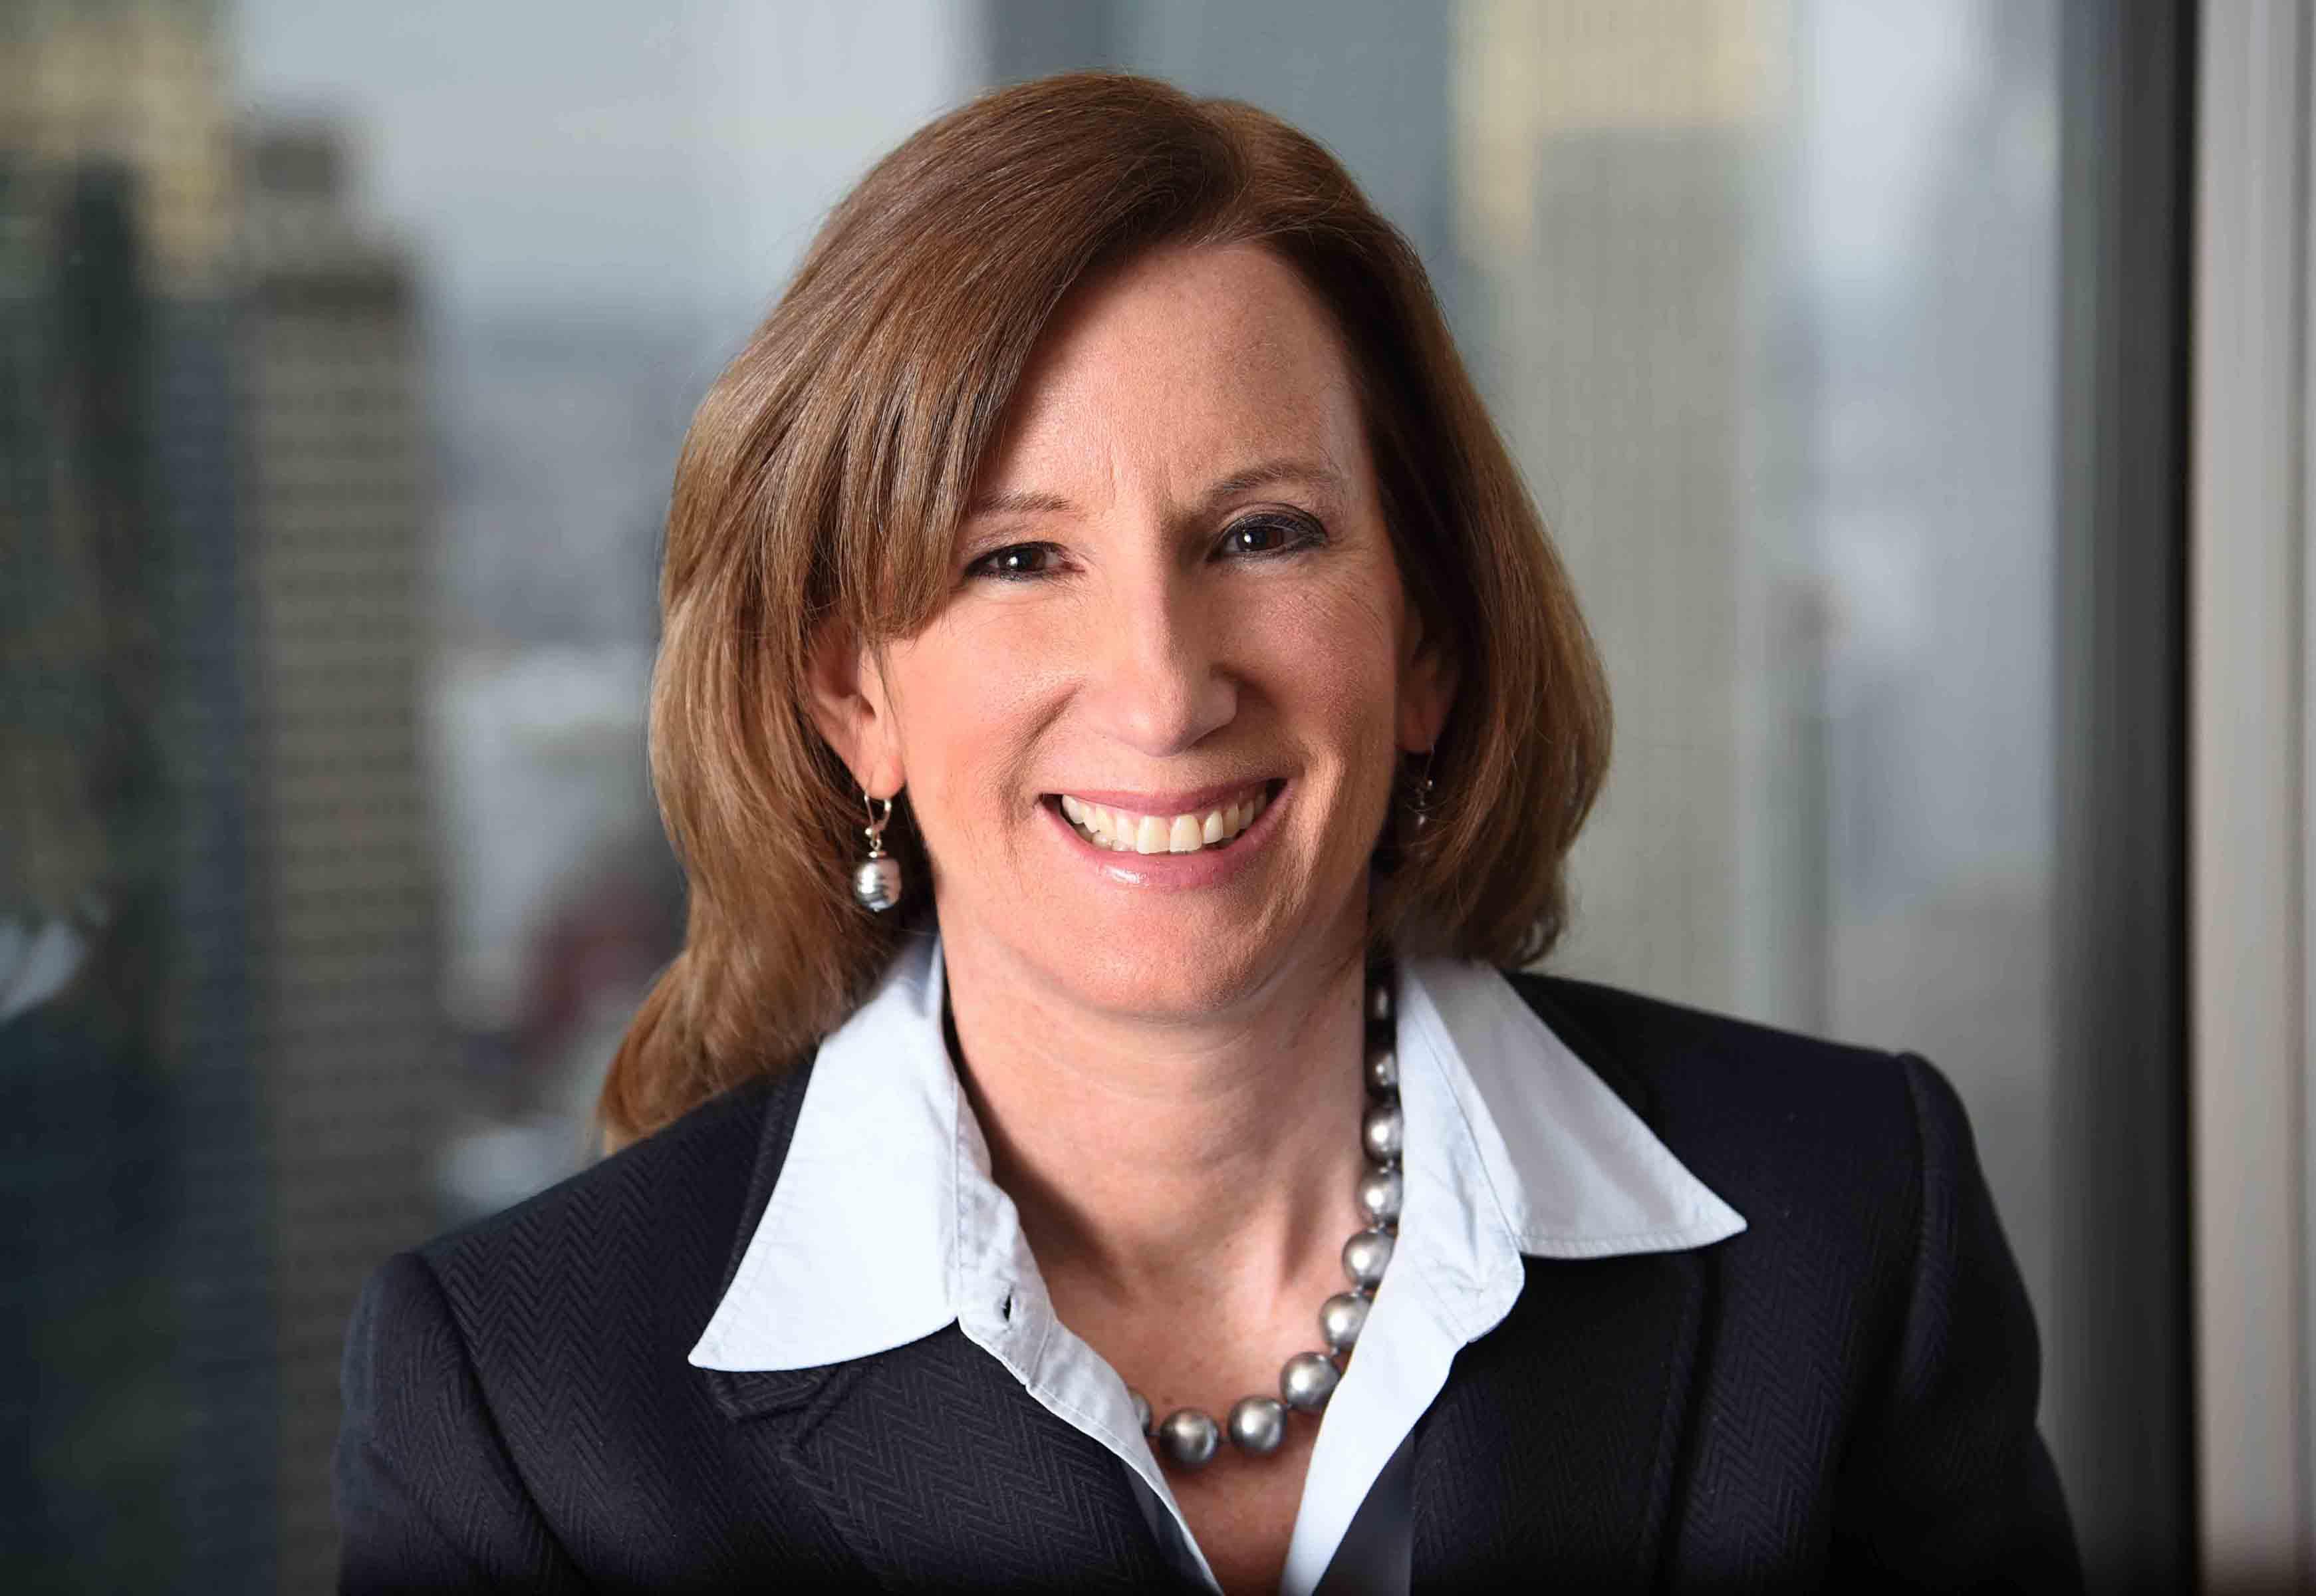 Cathy Engelbert, CEO of Deloitte LLP